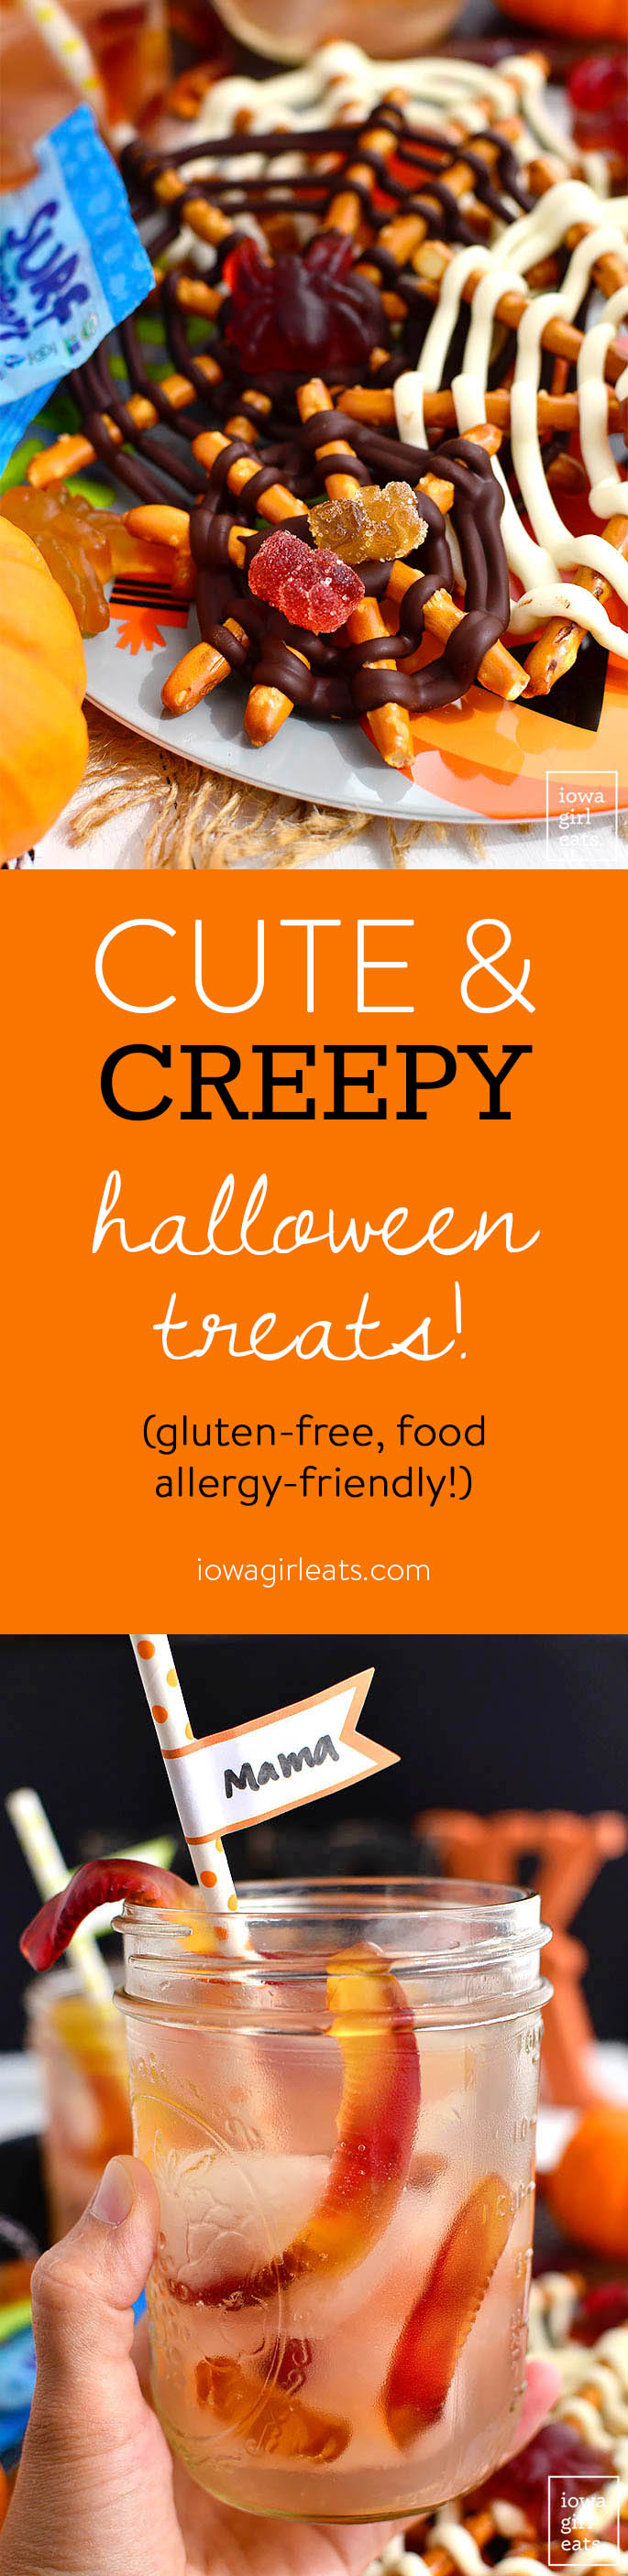 2 Cute and Creepy Halloween Treats - gluten-free and food allergy friendly!   iowagirleats.com